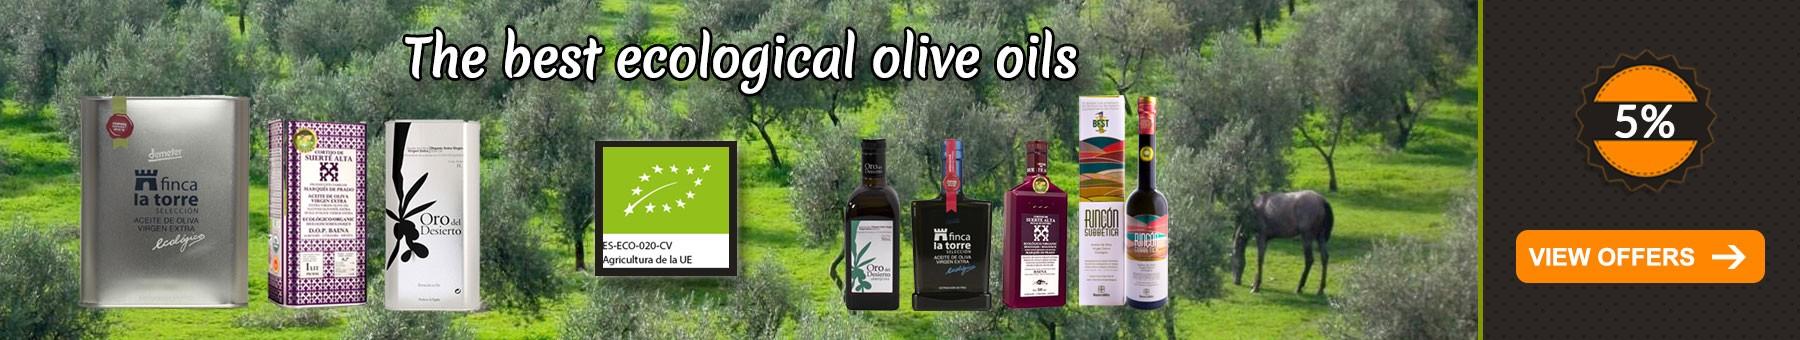 5% discount organic olive oils